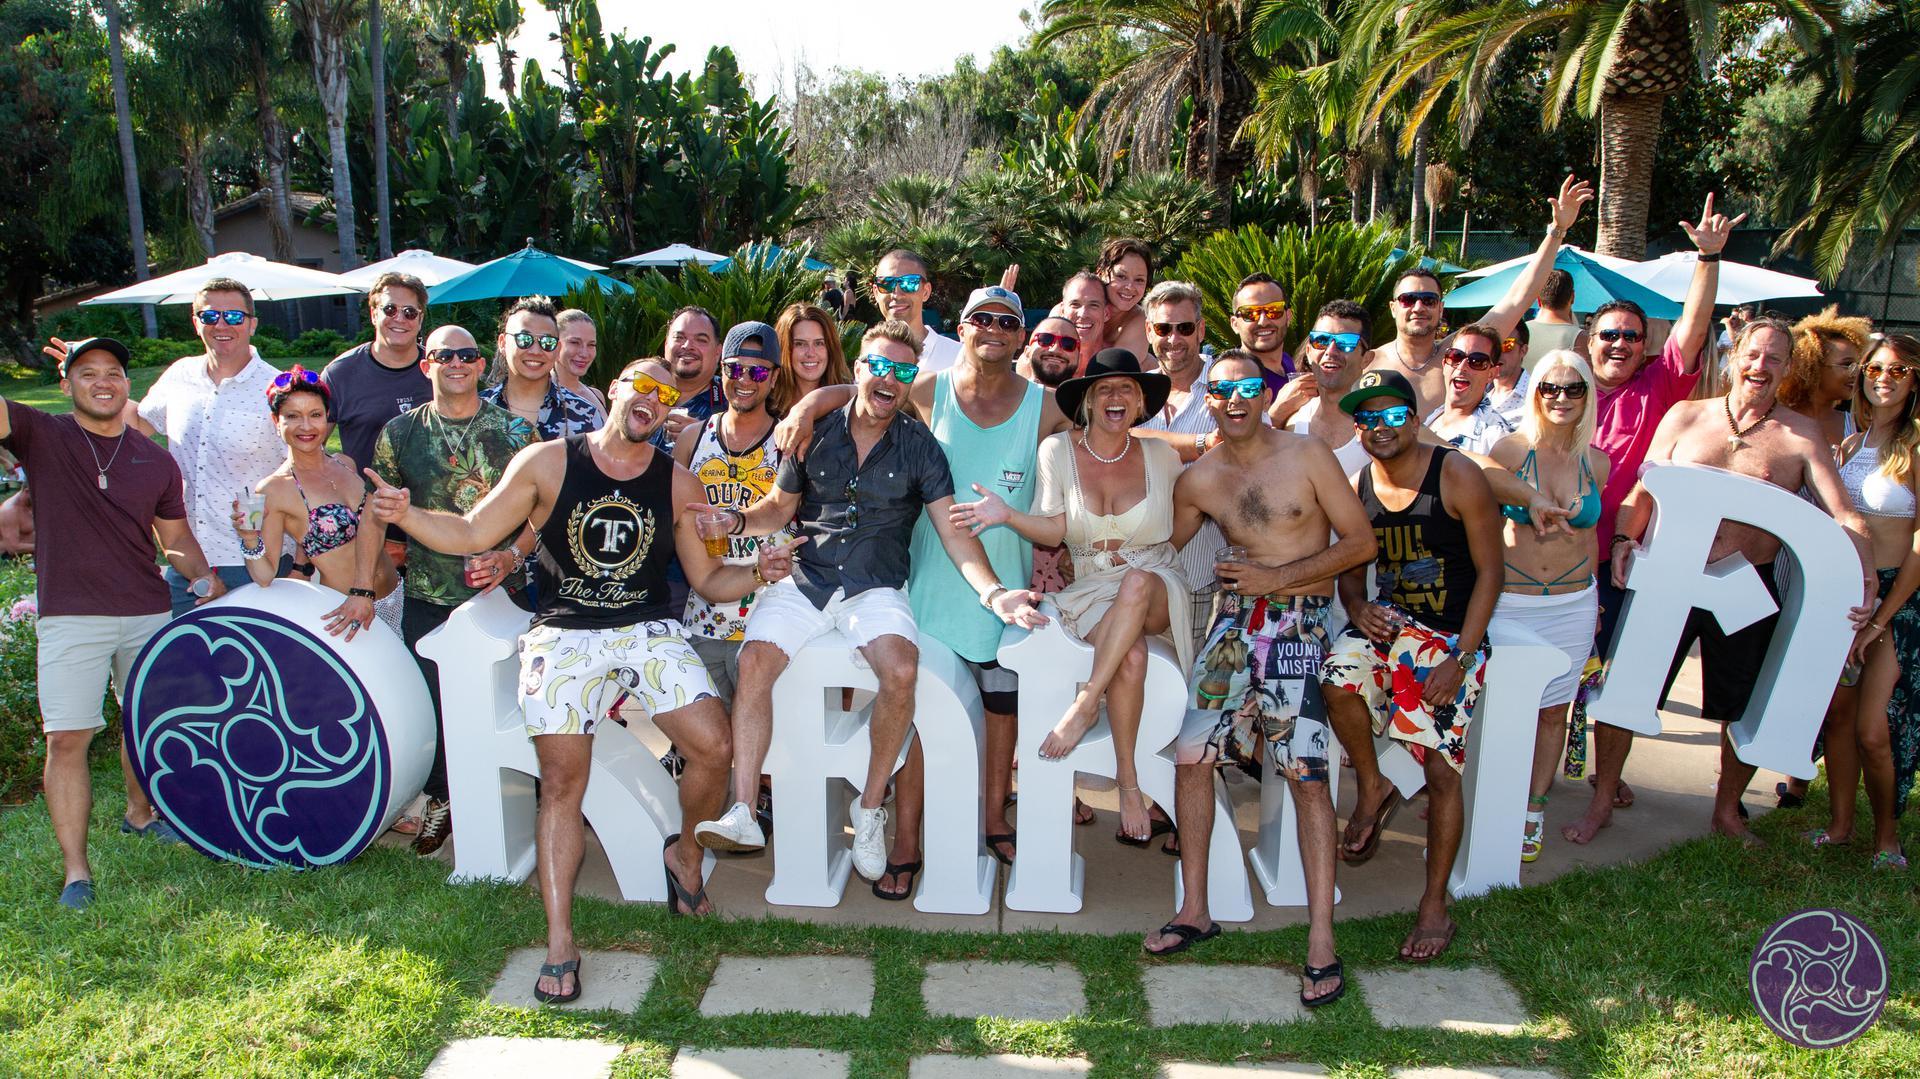 Karma International Pool Party by San Diego Creative Events-2.jpg